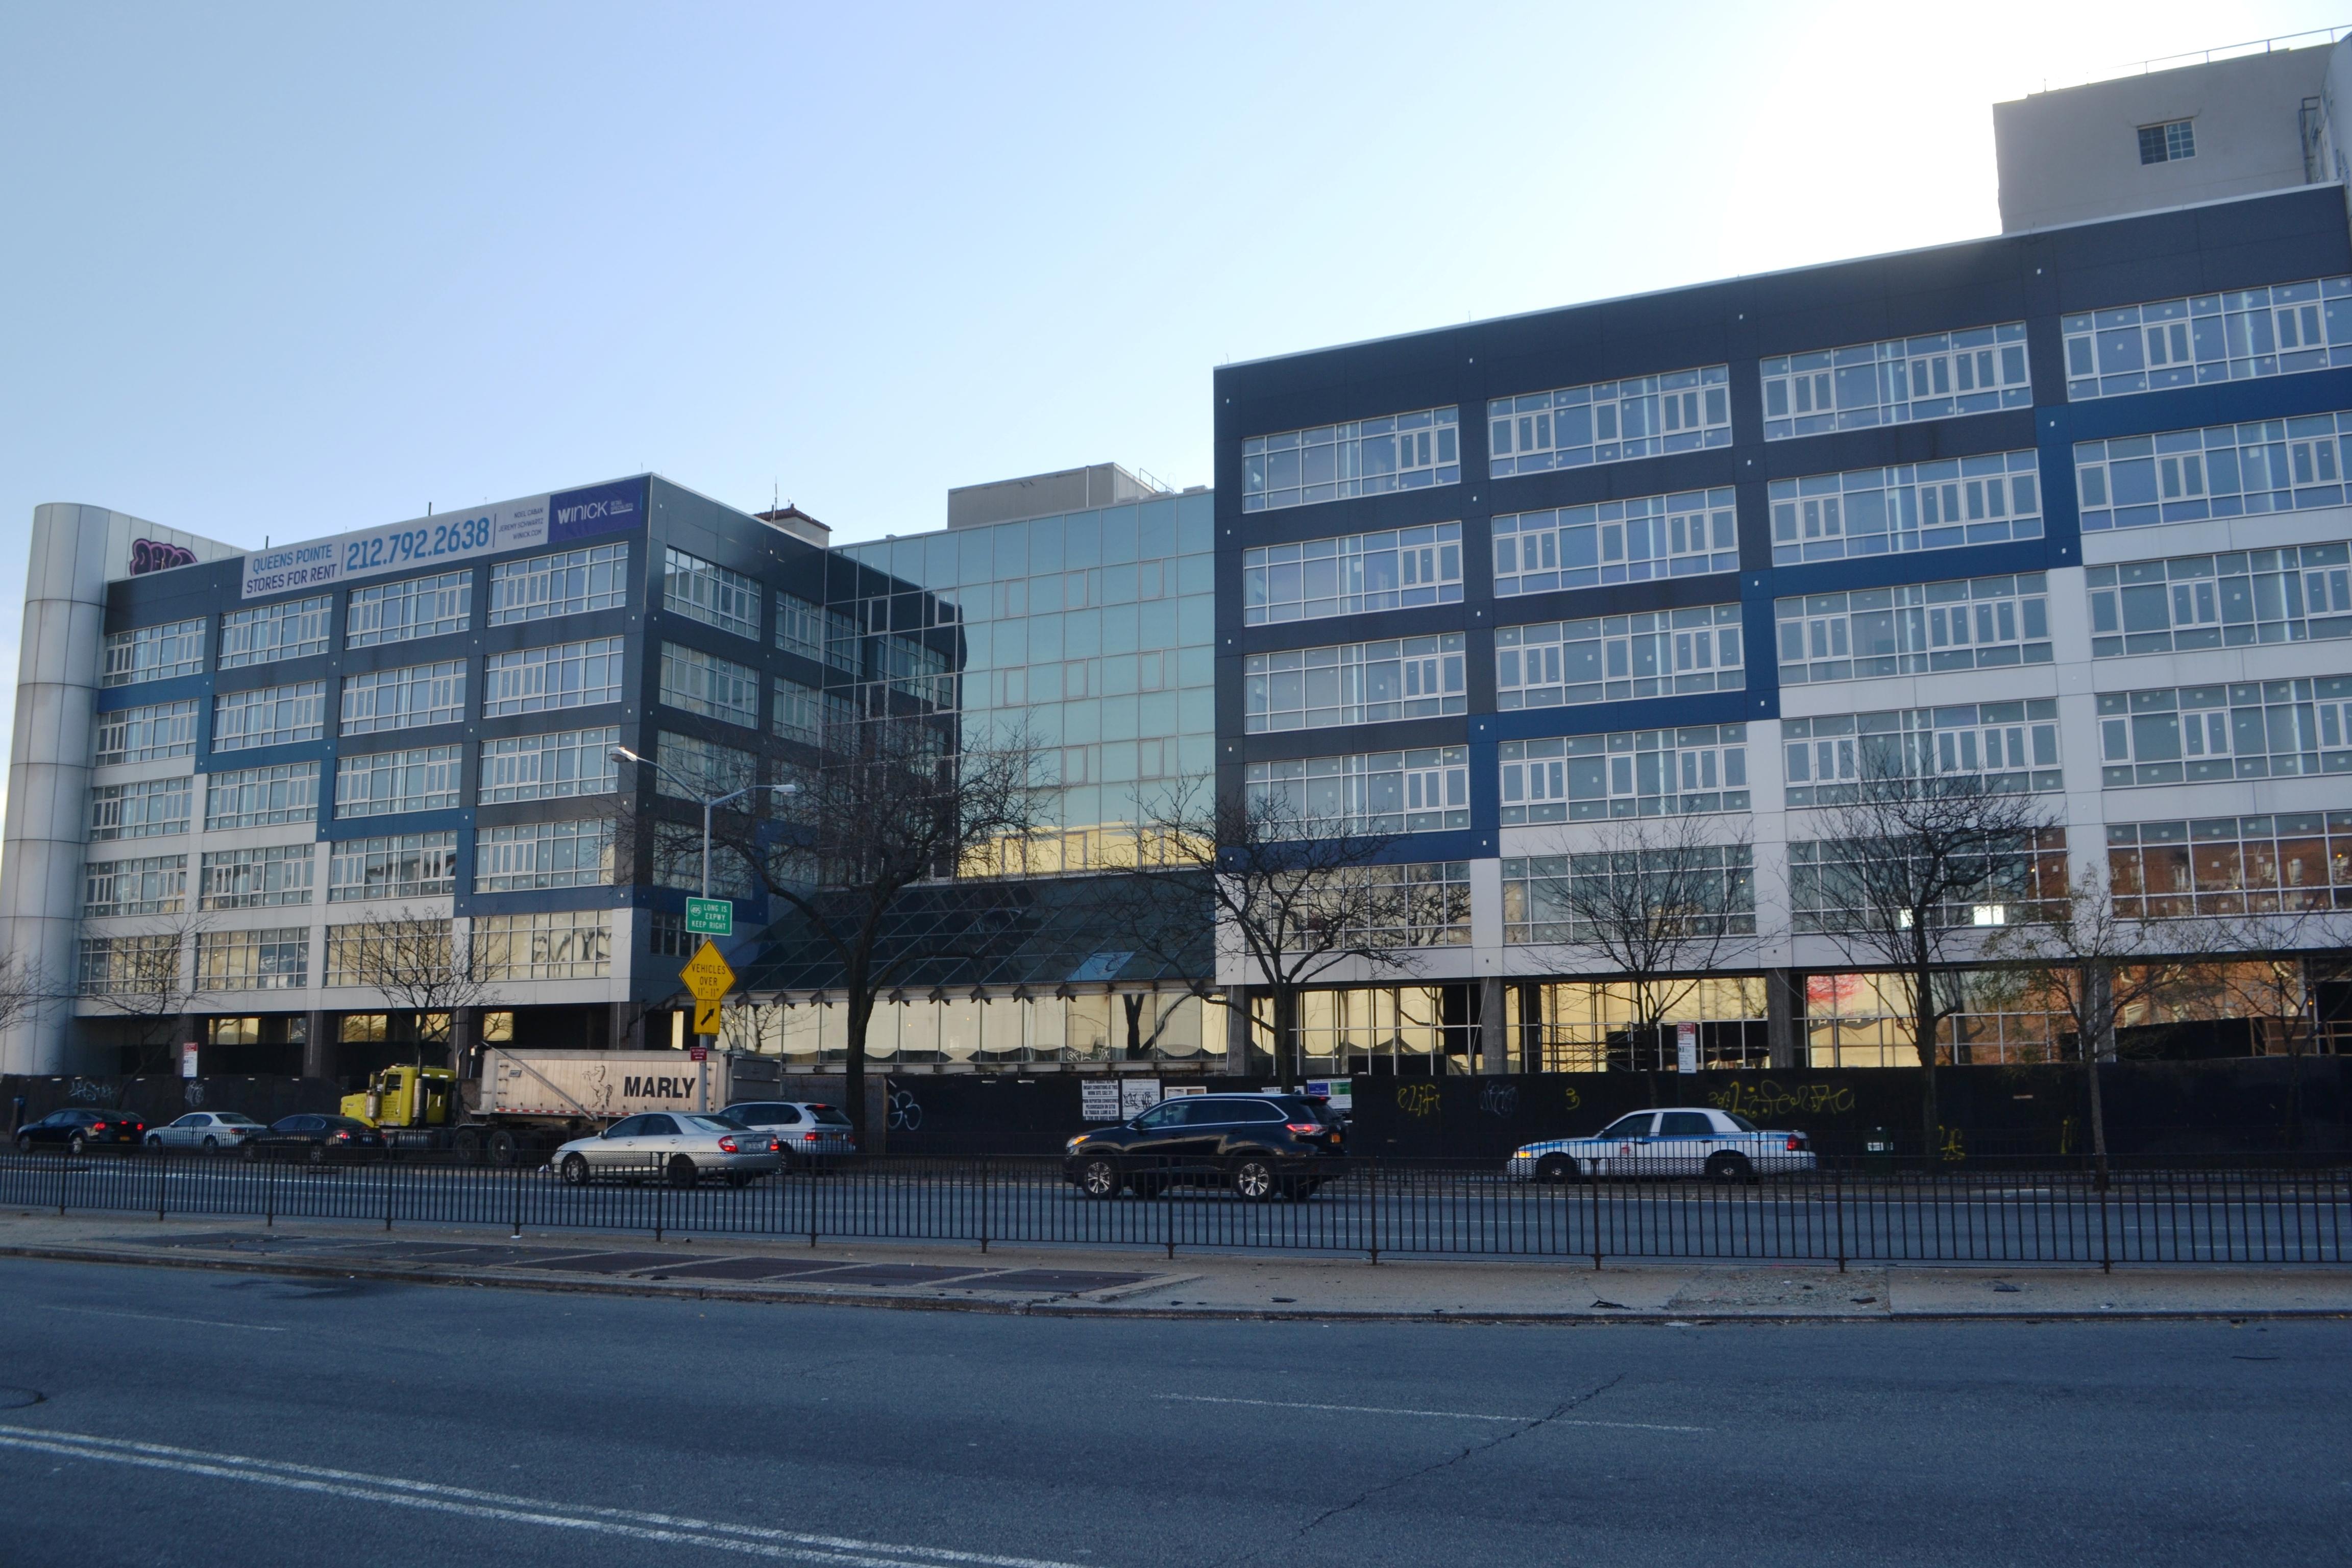 Inside St. John's Hospital's transformation into Queens Pointe development